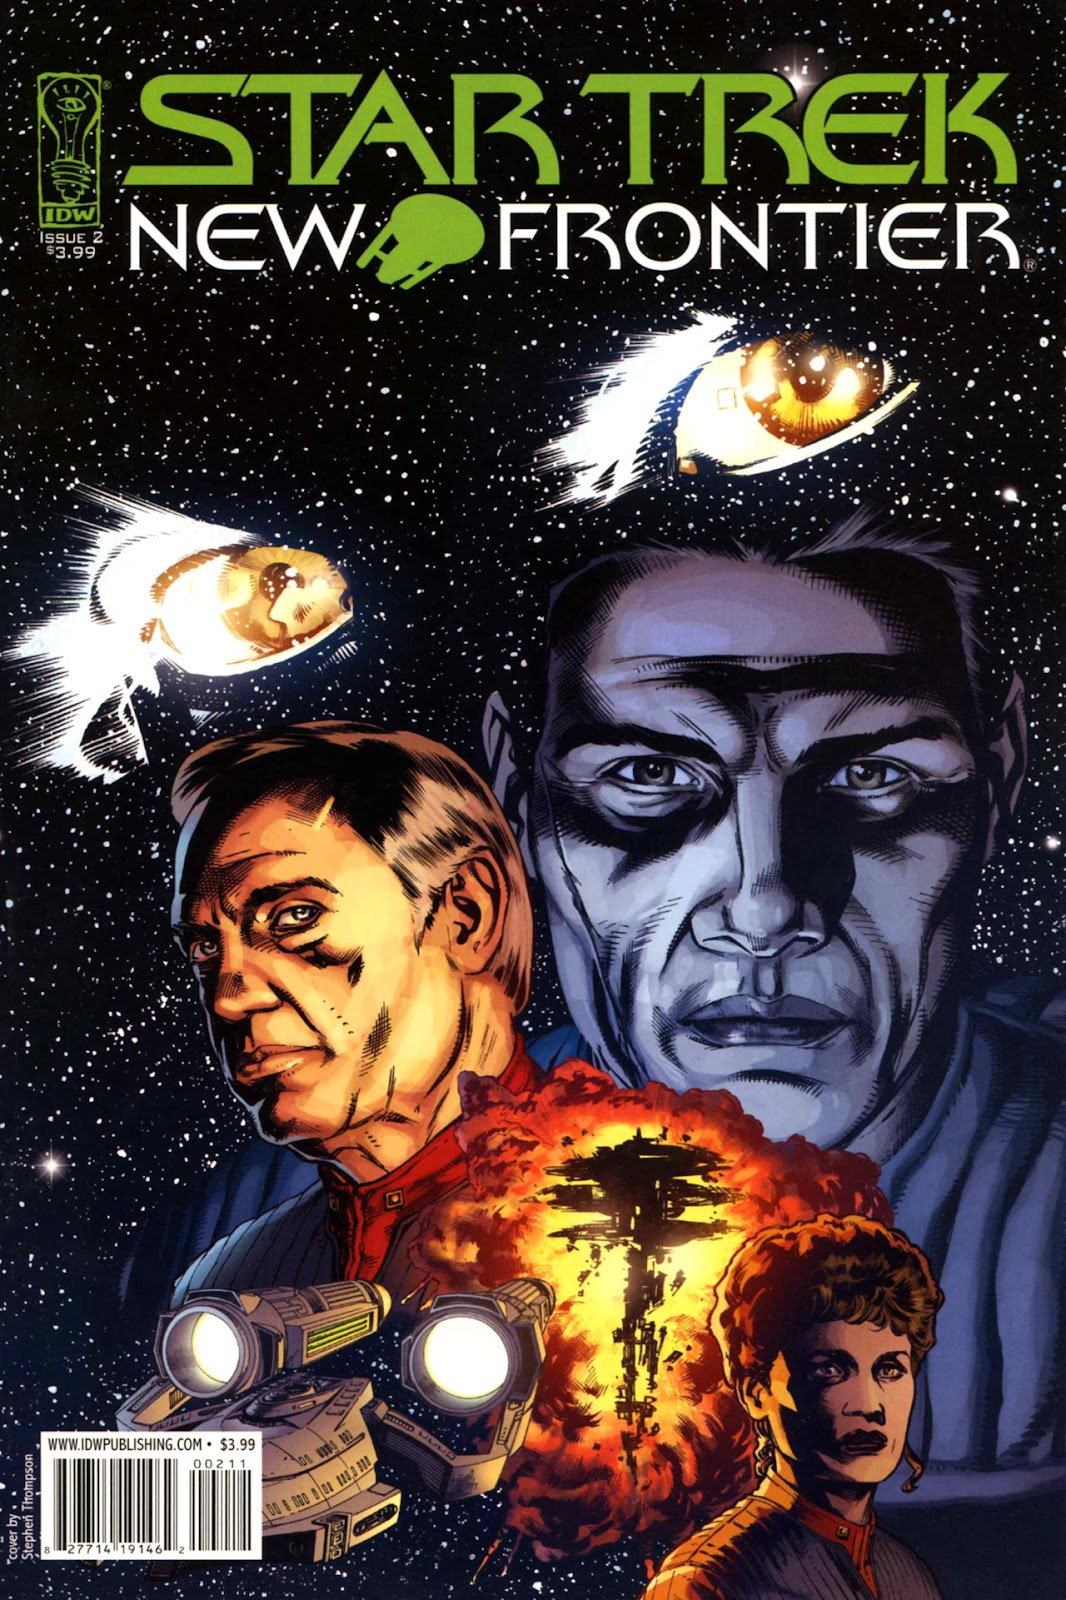 Comic Star Trek: New Frontier issue 2